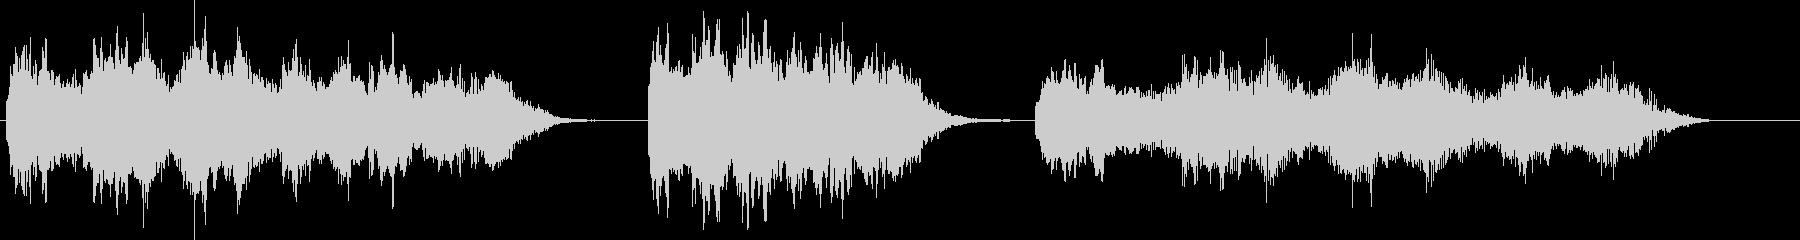 Vs-2400悪の存在、いくつかの攻撃の未再生の波形